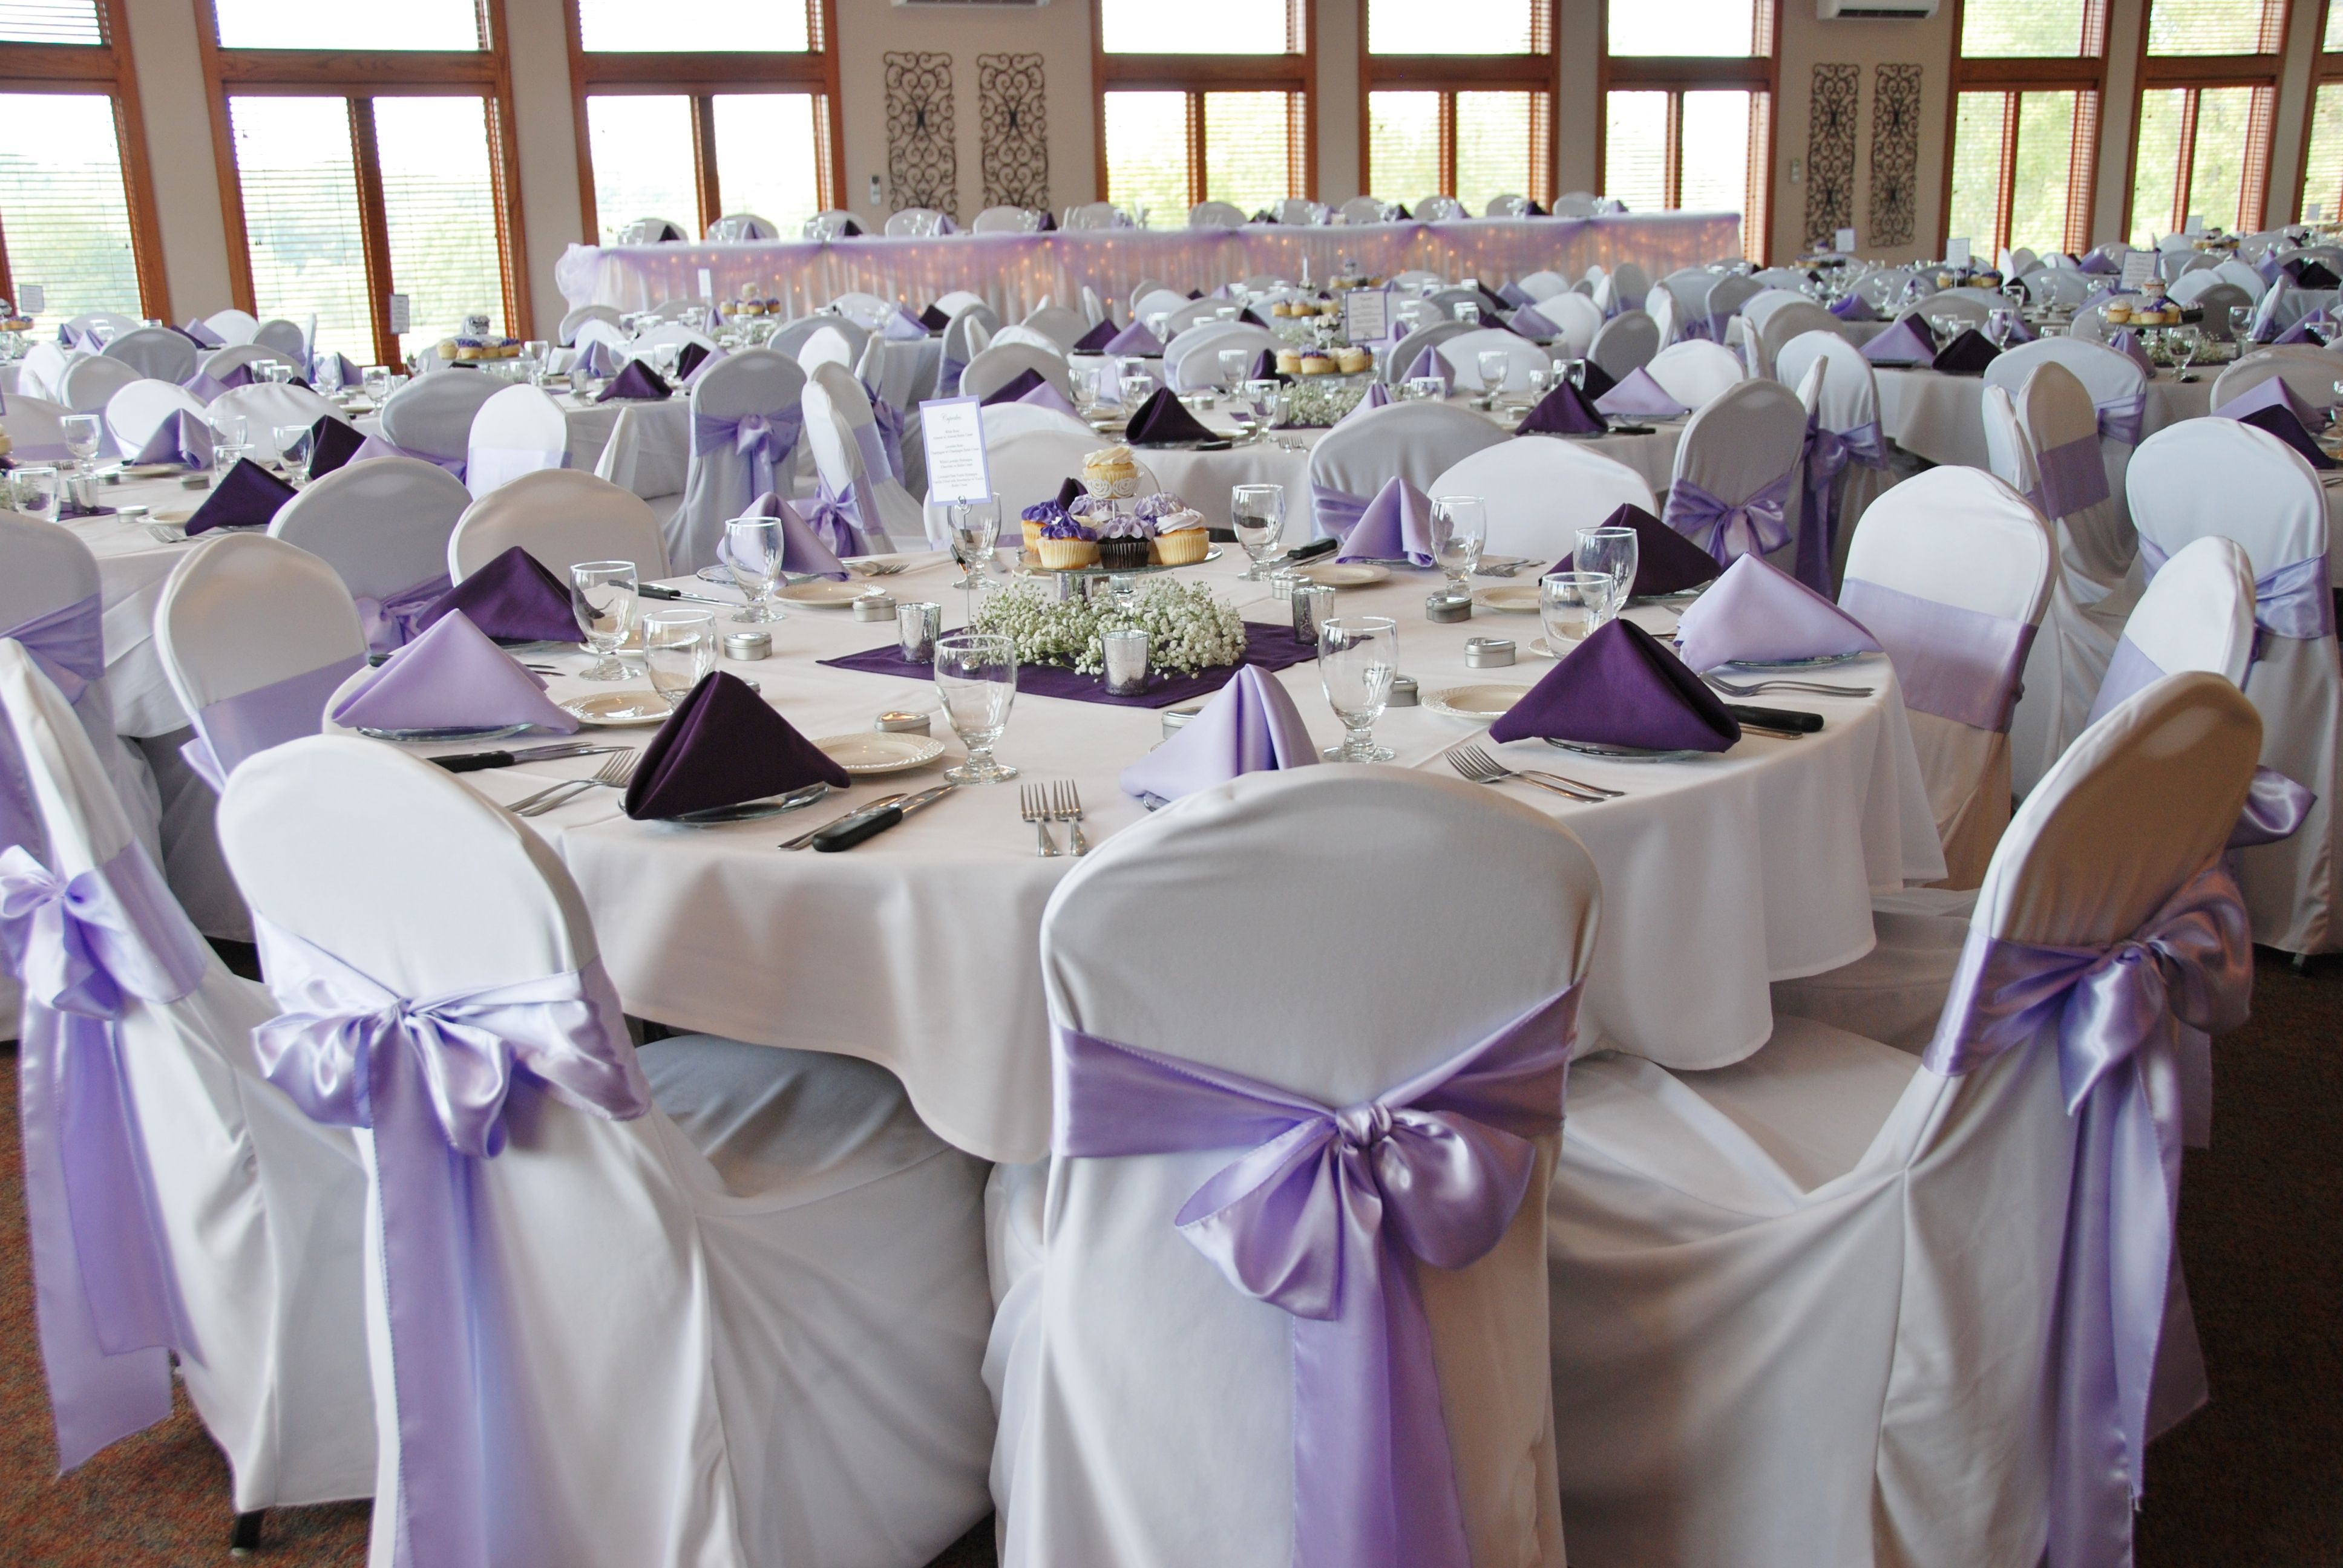 Lavender Wedding Chair Covers Lavender Sashes Reception Decor Elegant Wedding Wedding Chairs White Chair Covers Wedding Linens